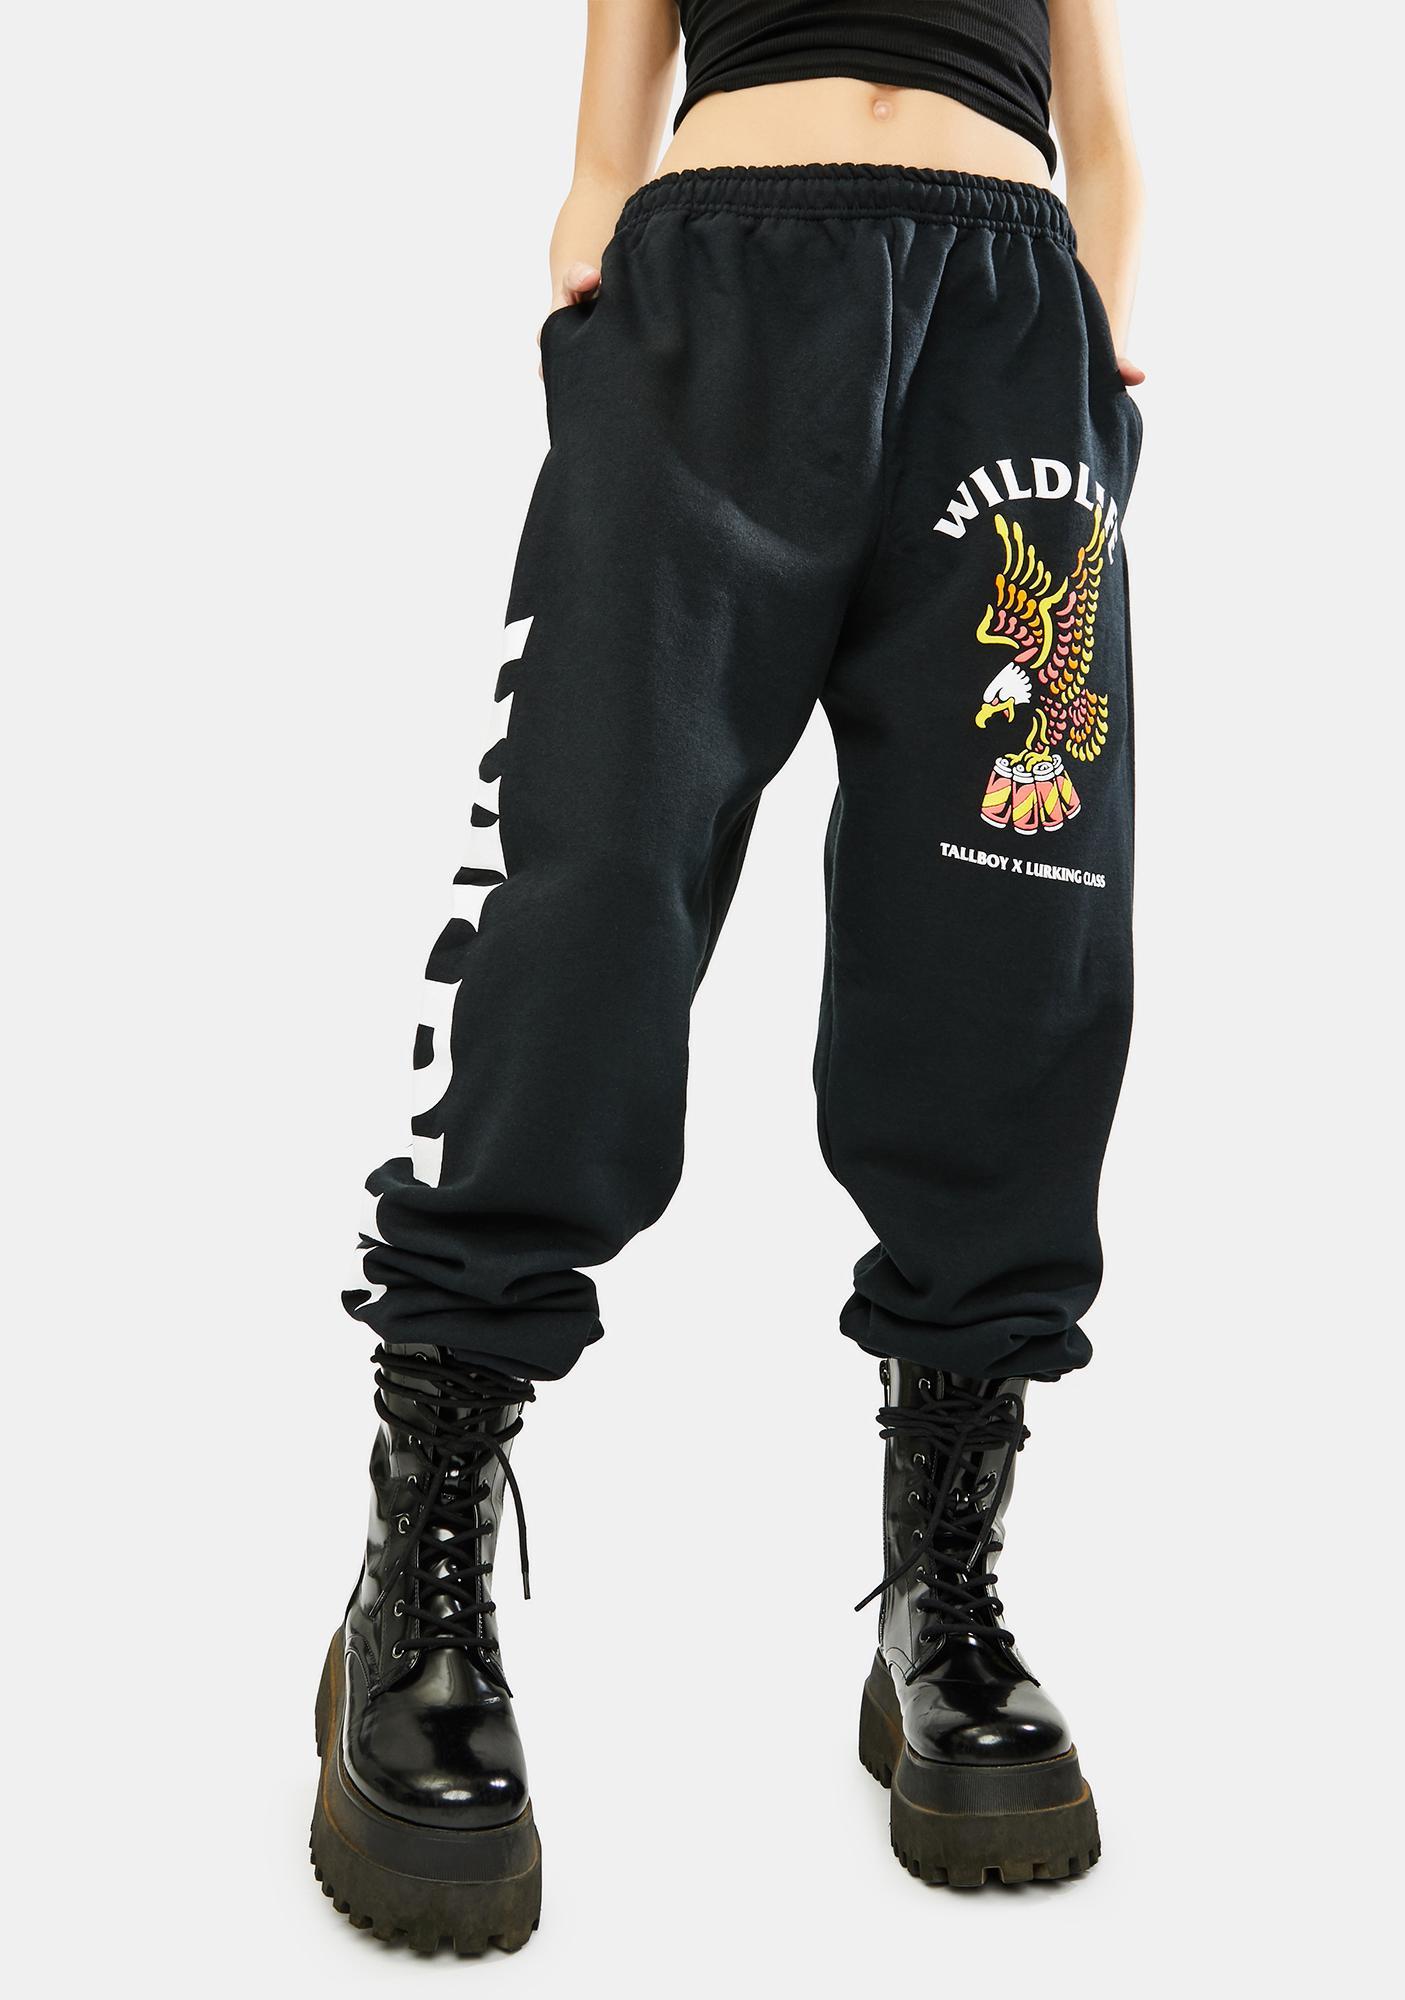 Lurking Class Wild Life X Tallboy Graphic Sweatpants